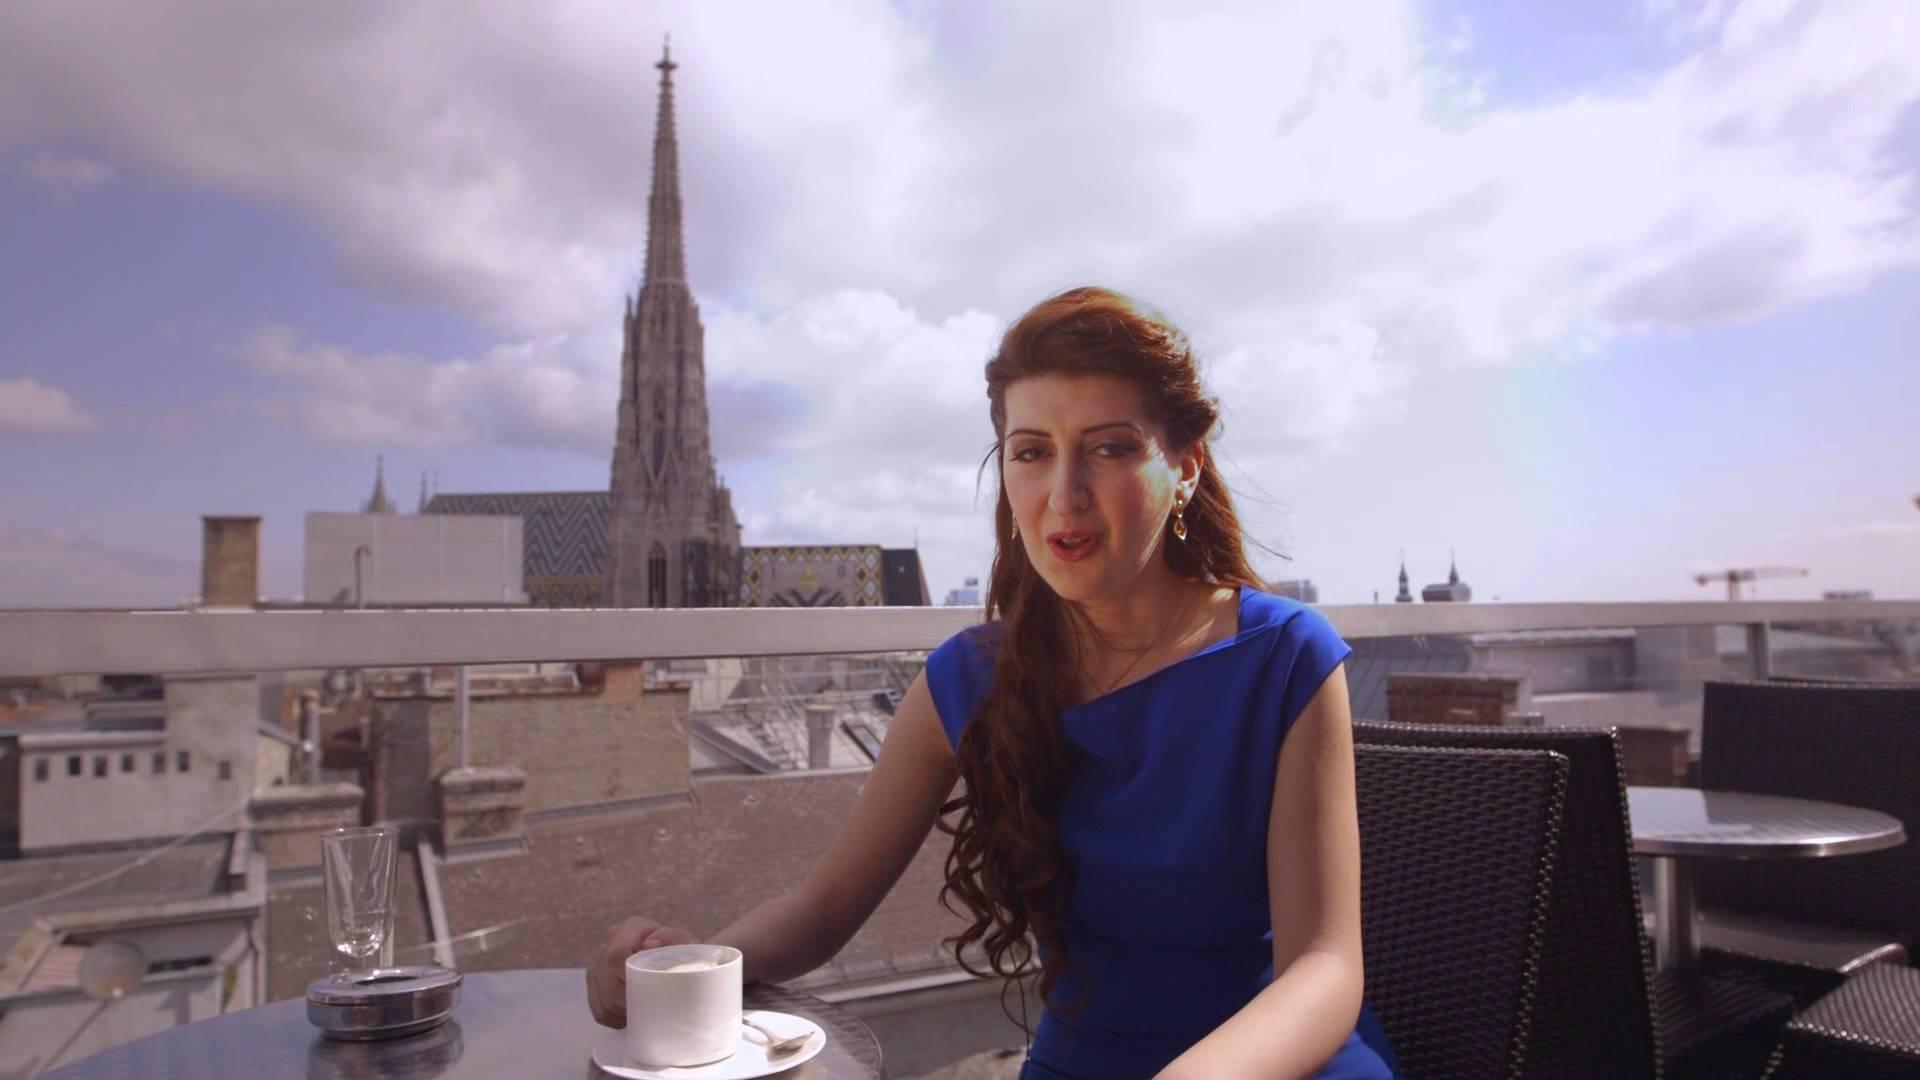 Austrian pianist cancels US tour due to visa issues